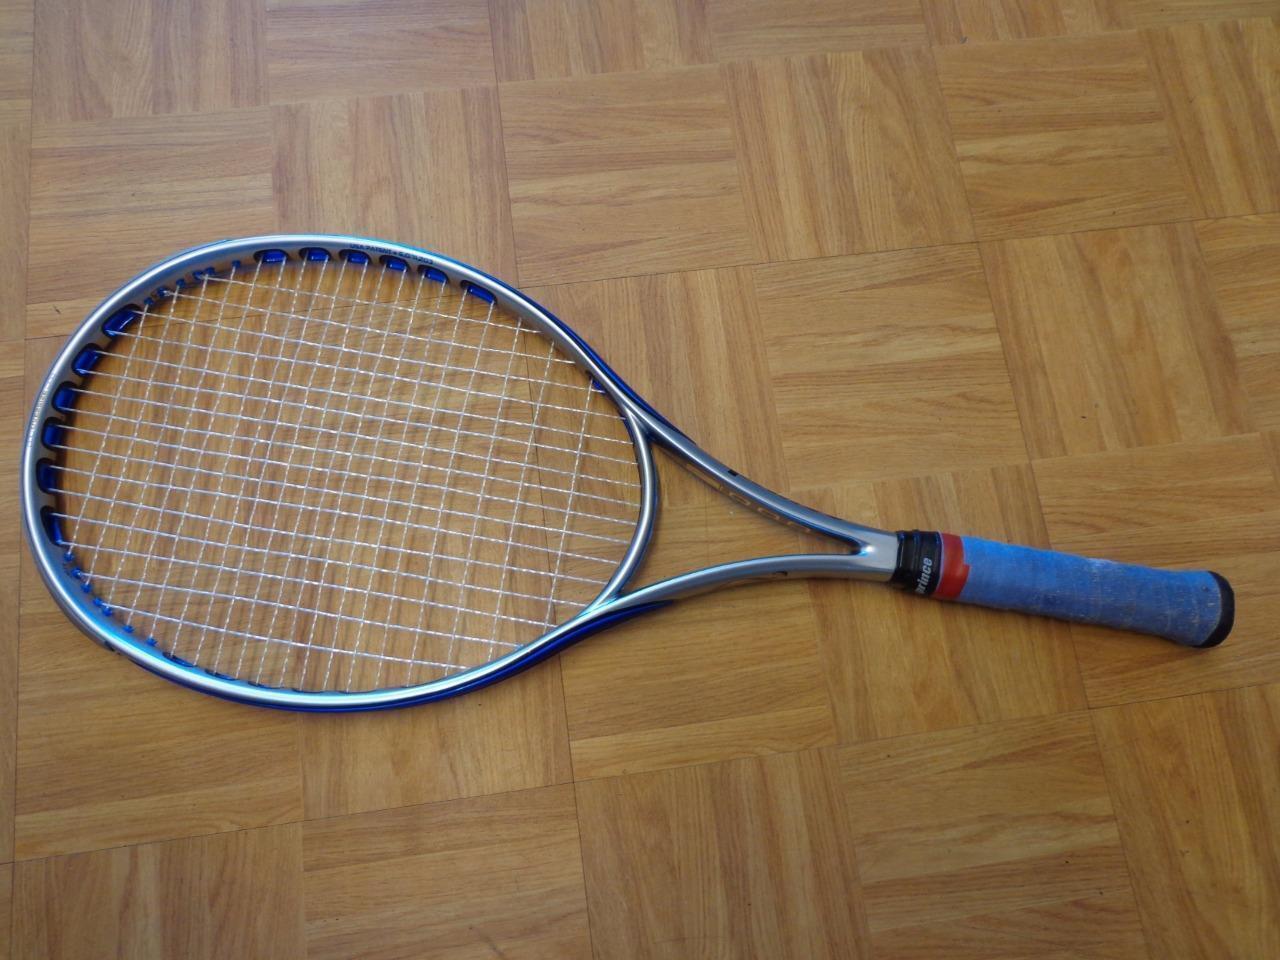 Prince O3 Speedport Azul 110 cabeza 4 3 8 Grip Tenis Raqueta